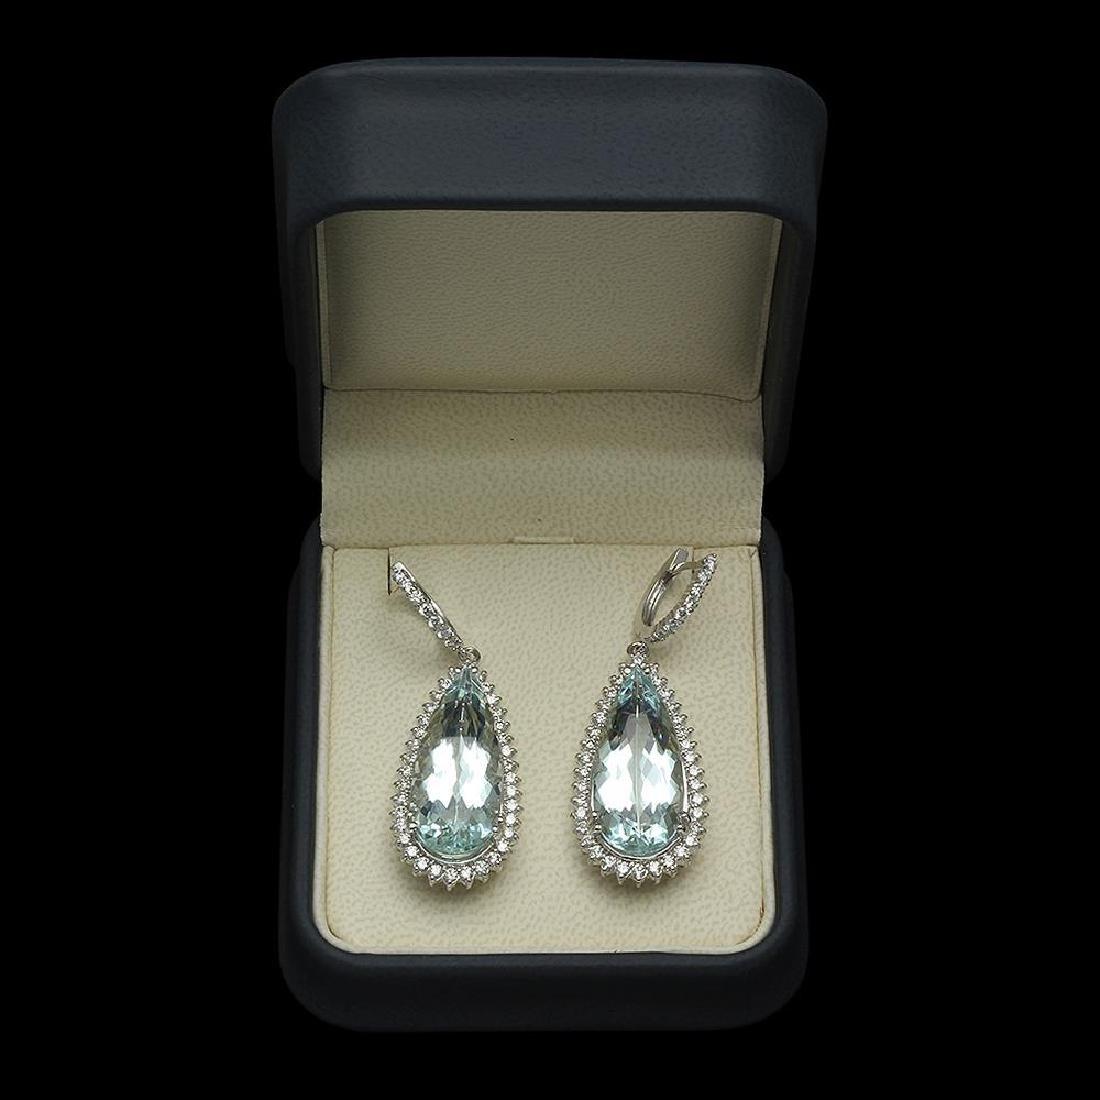 14K Gold 28.67ct Aquamarine 2.41ct Diamond Earrings - 2